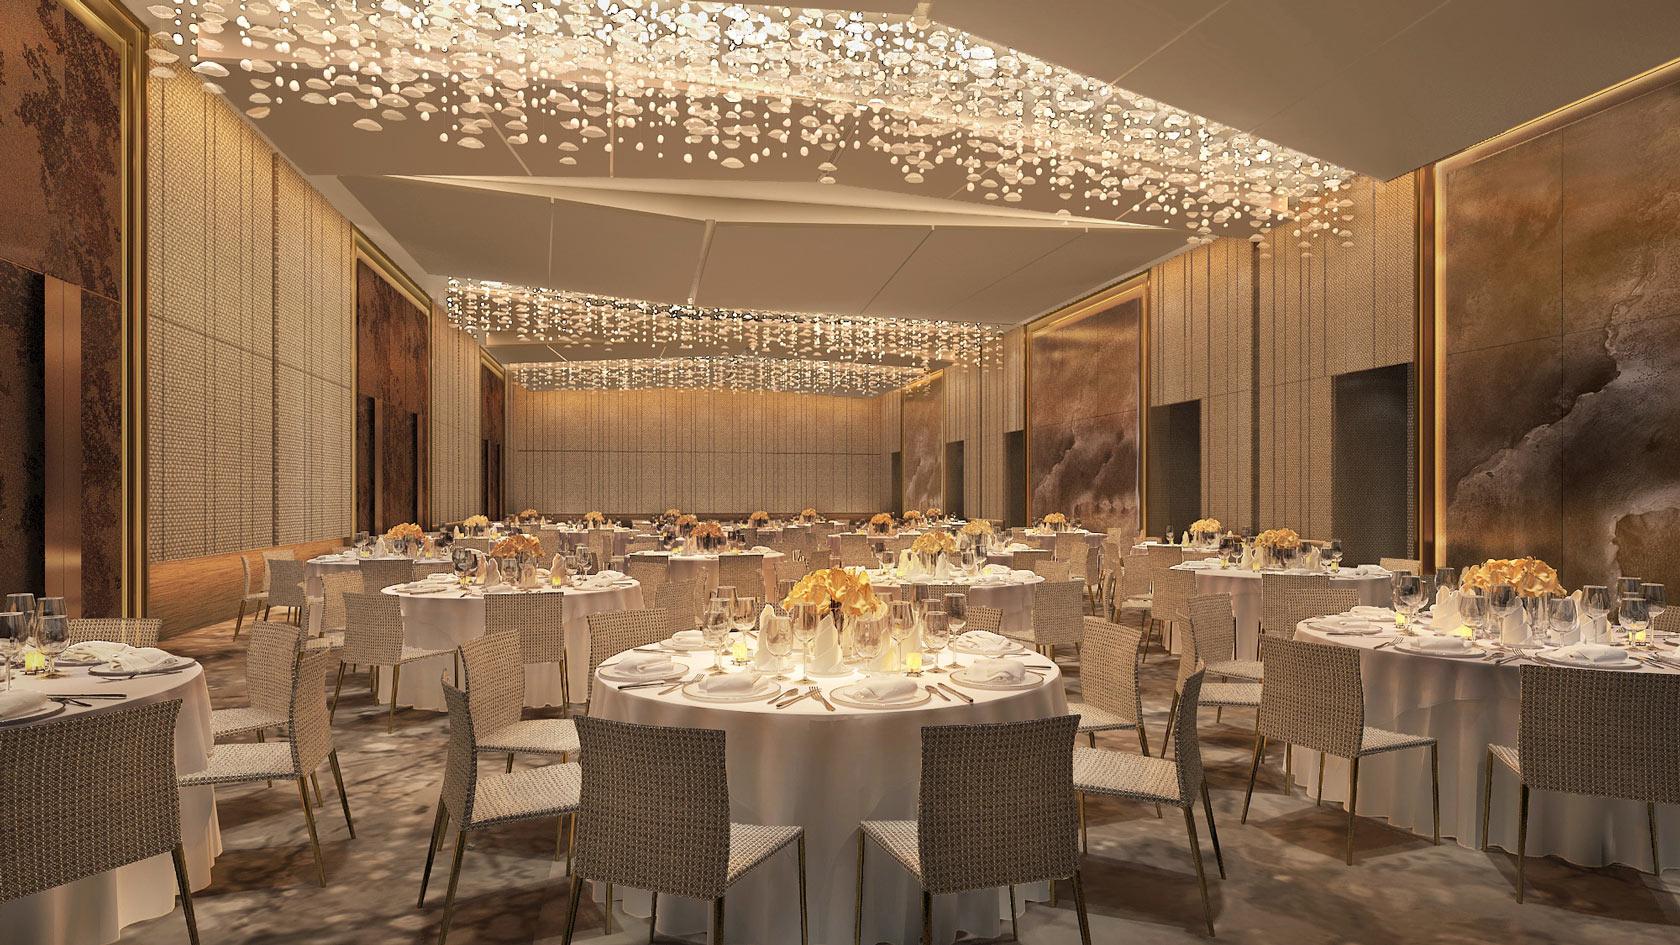 The hotel's grand ballroom